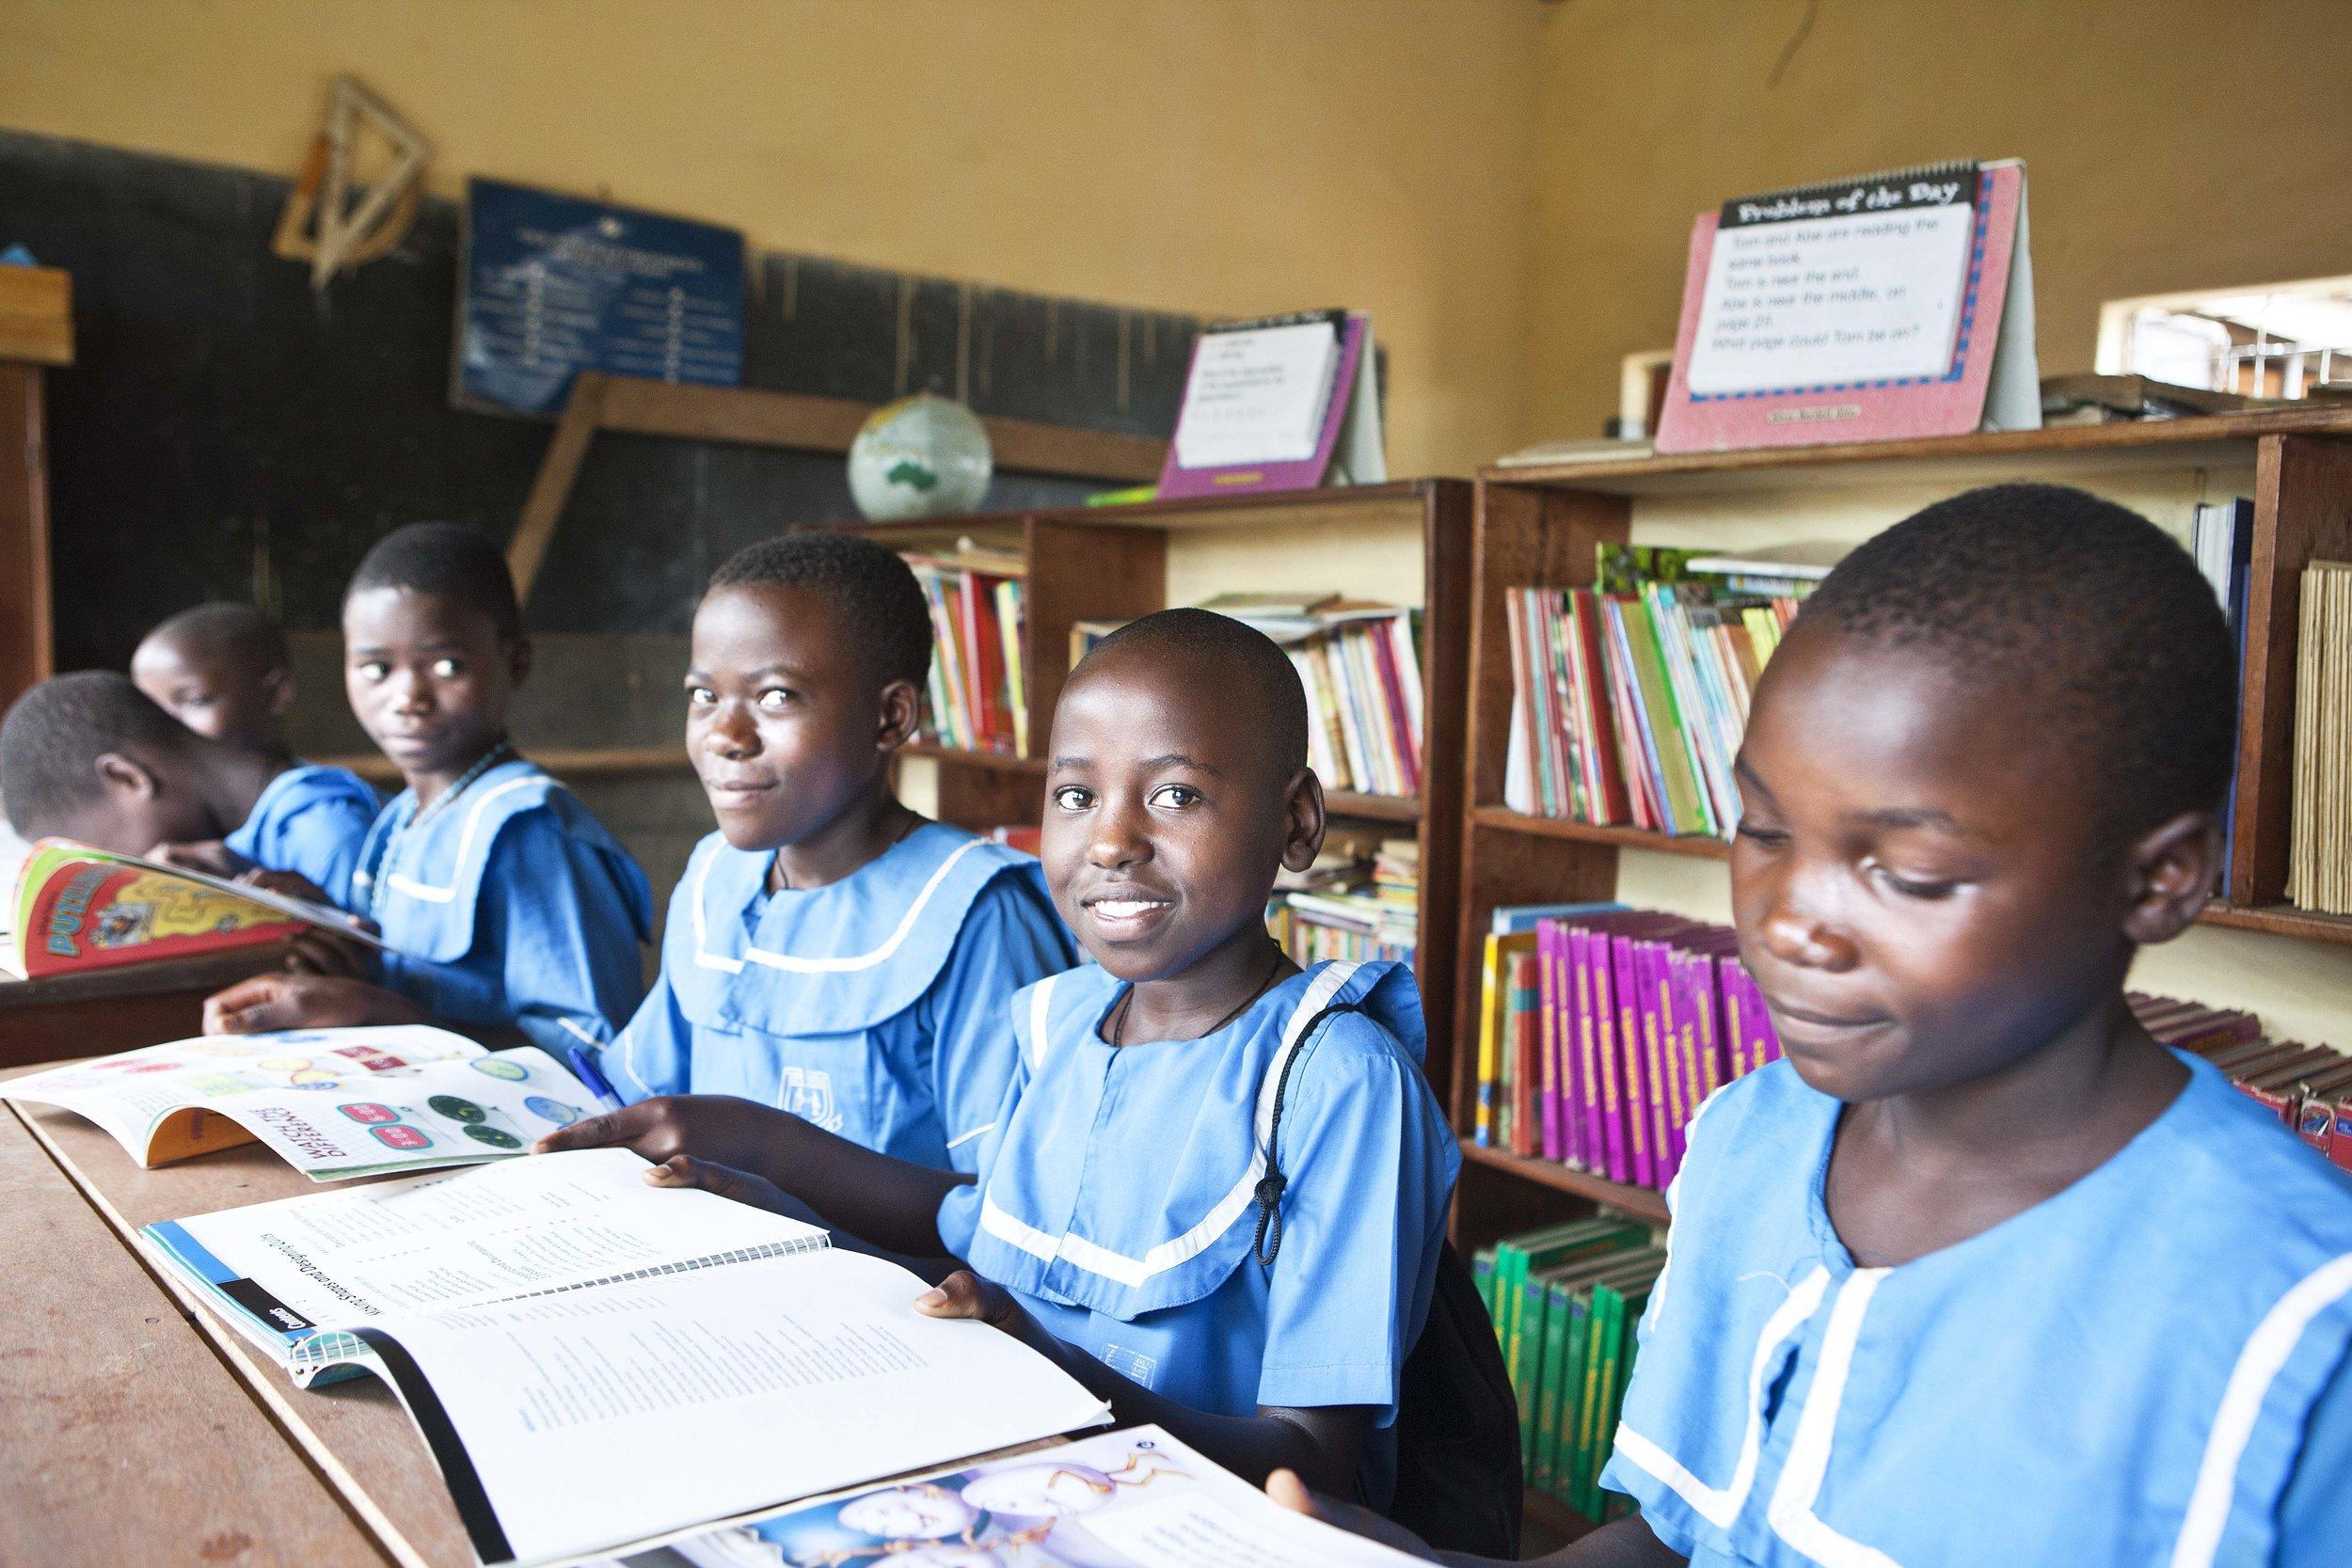 Education_Girls in Library 2.jpg